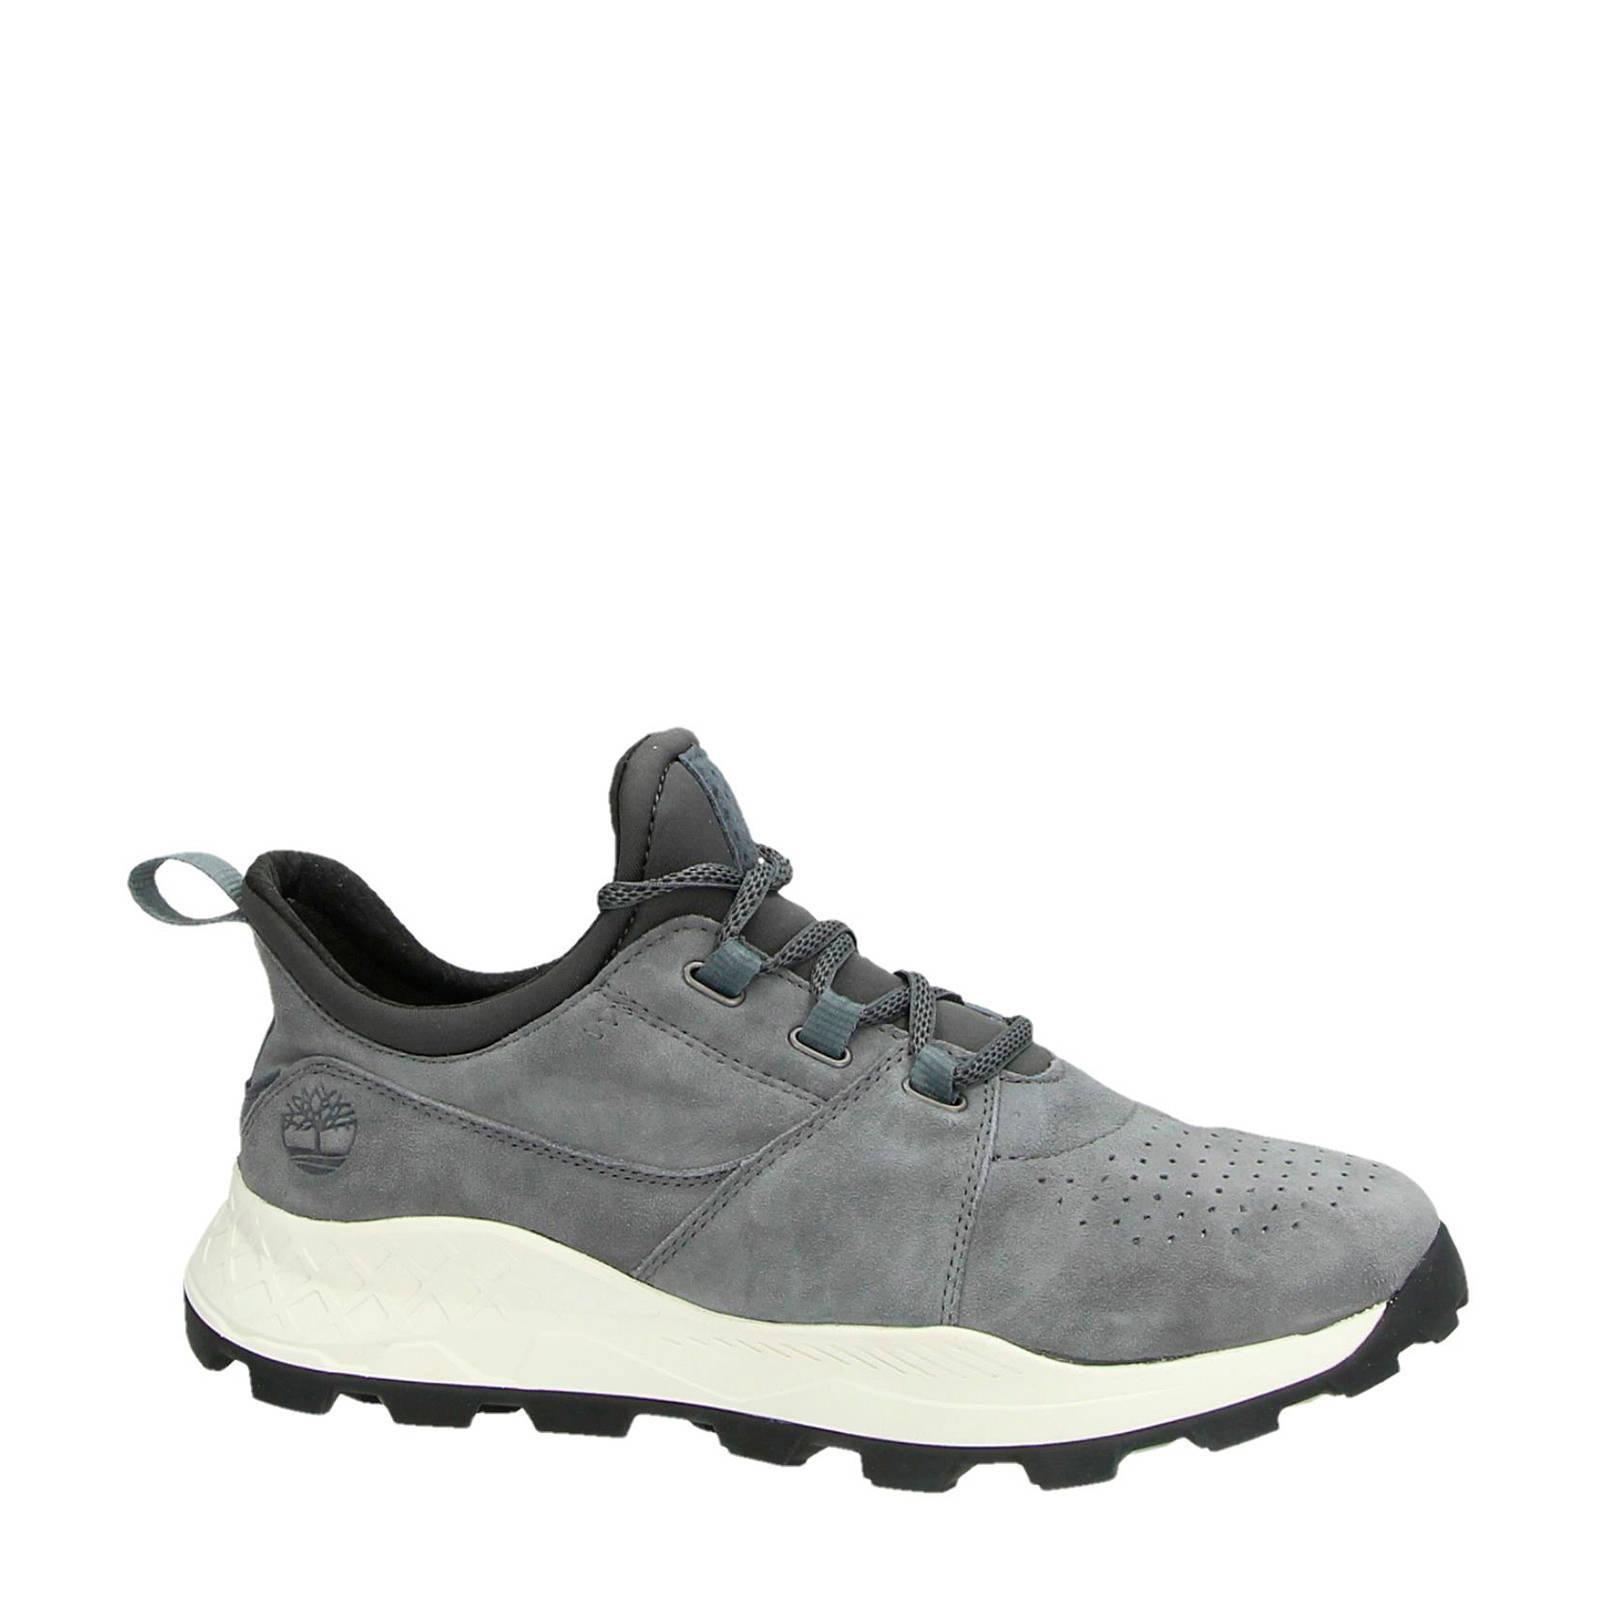 c0e6847525c timberland-brooklyn-oxford-suede-sneakers-grijs-grijs-8719796144691.jpg